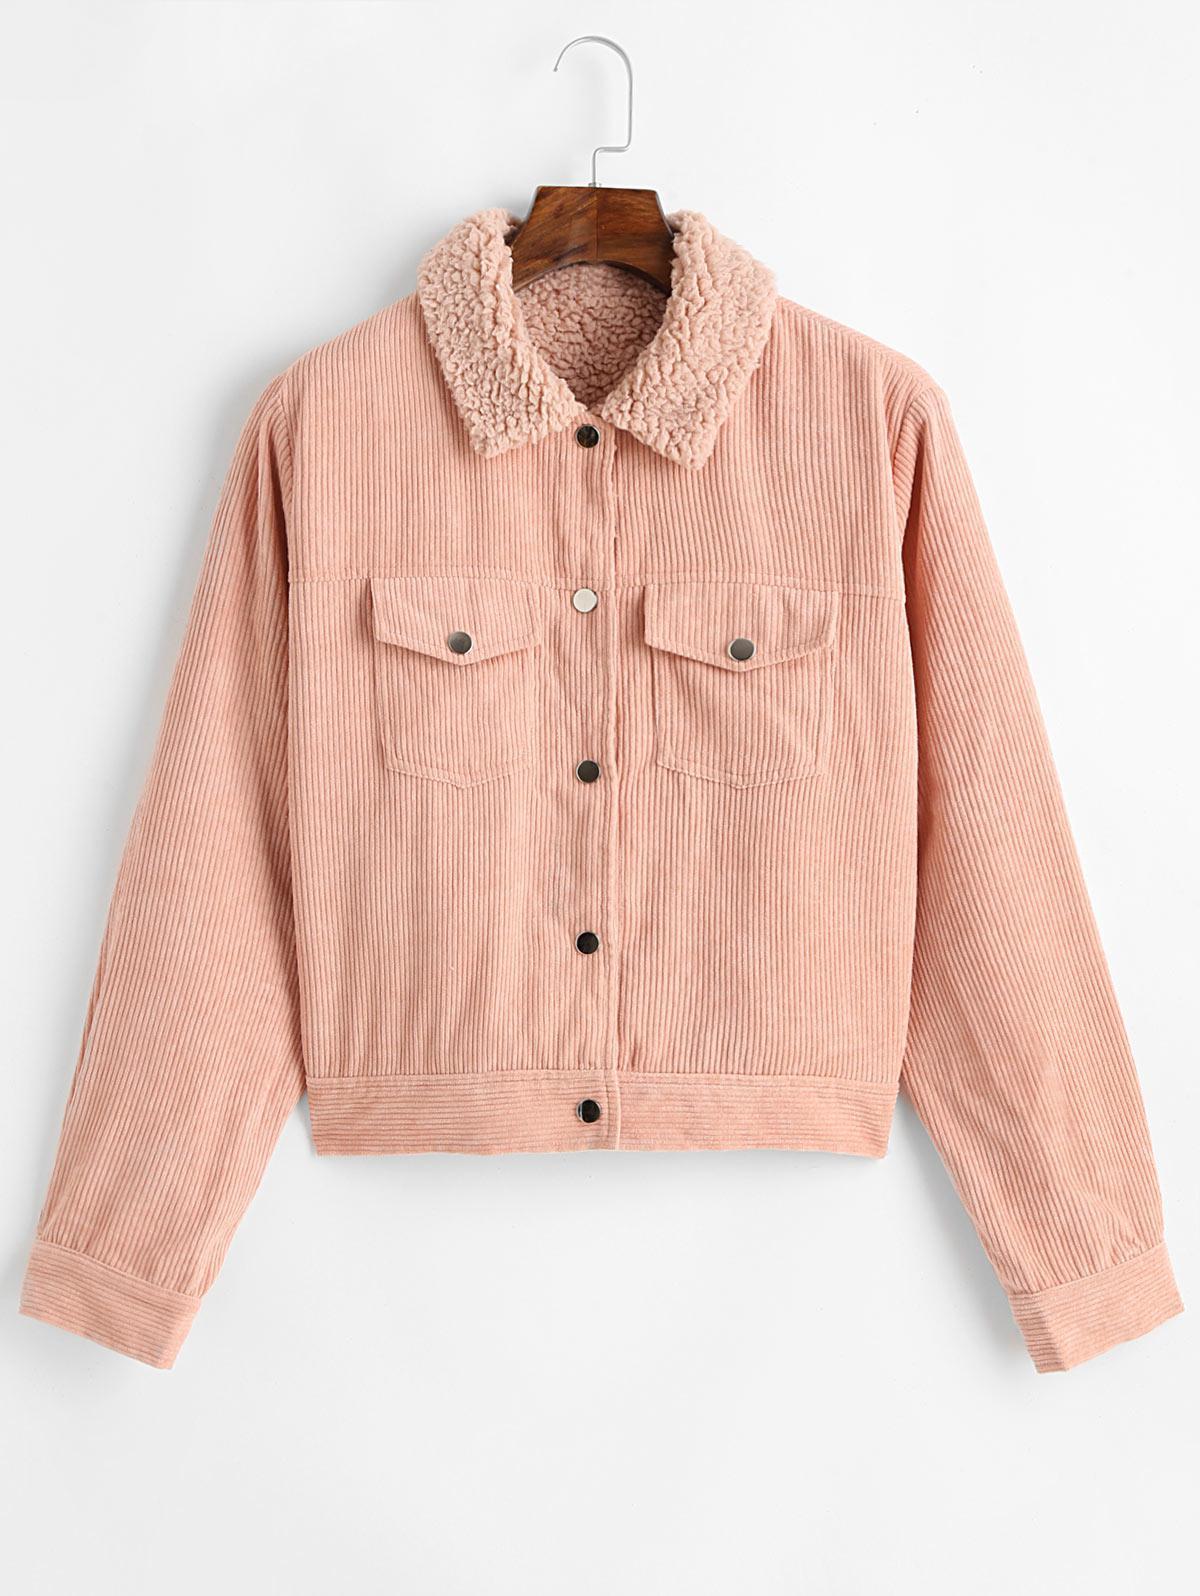 ZAFUL Button Up Pockets Corduroy Fleece Lined Jacket thumbnail